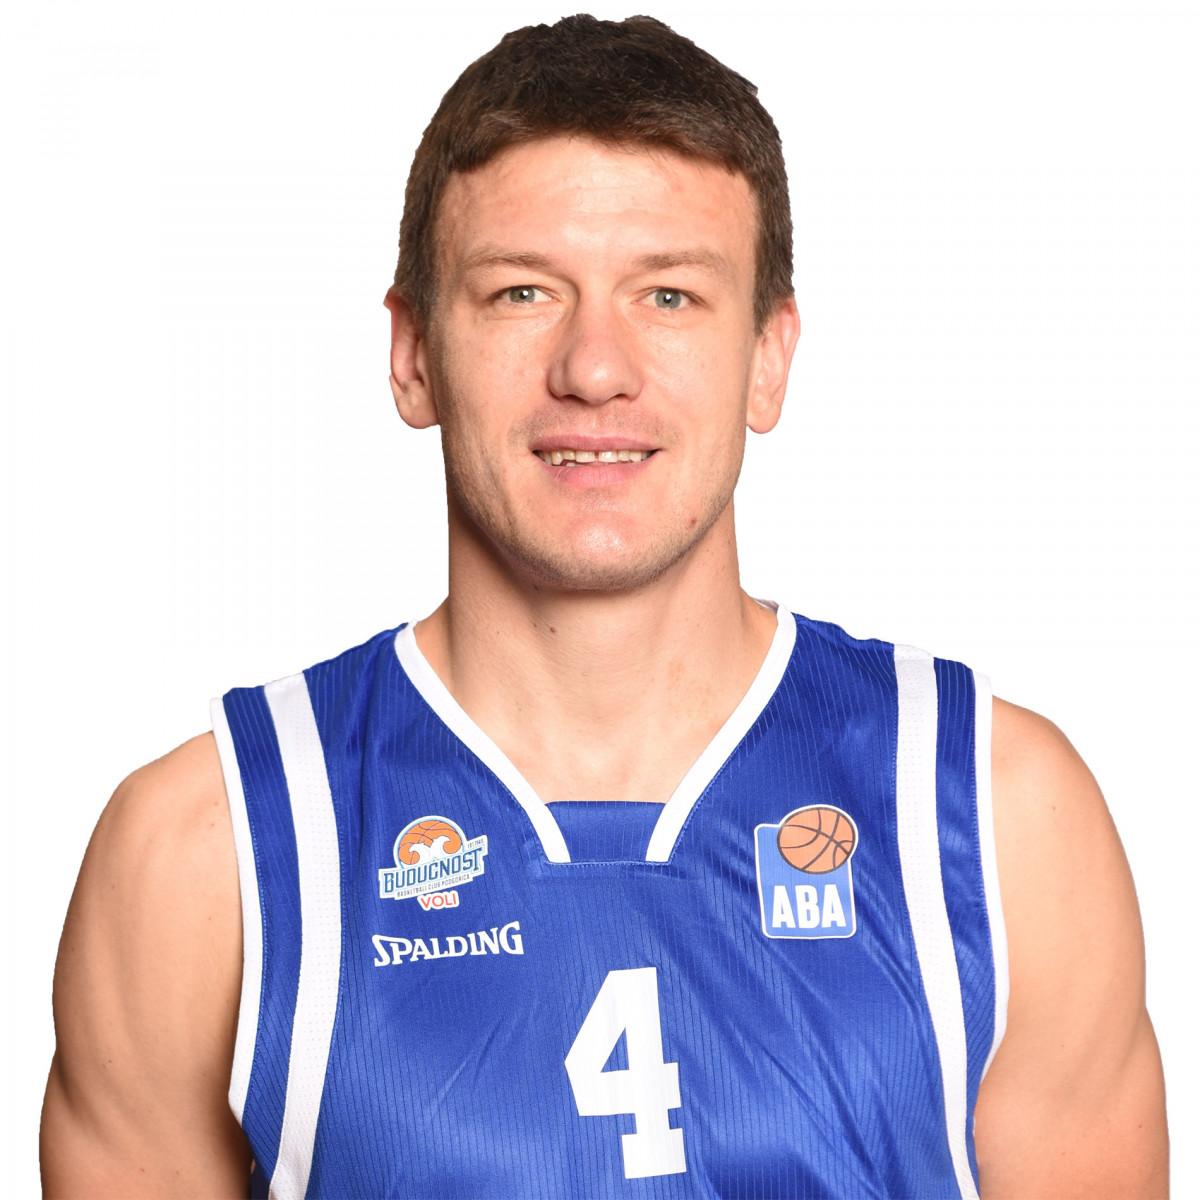 Photo of Suad Sehovic, 2018-2019 season